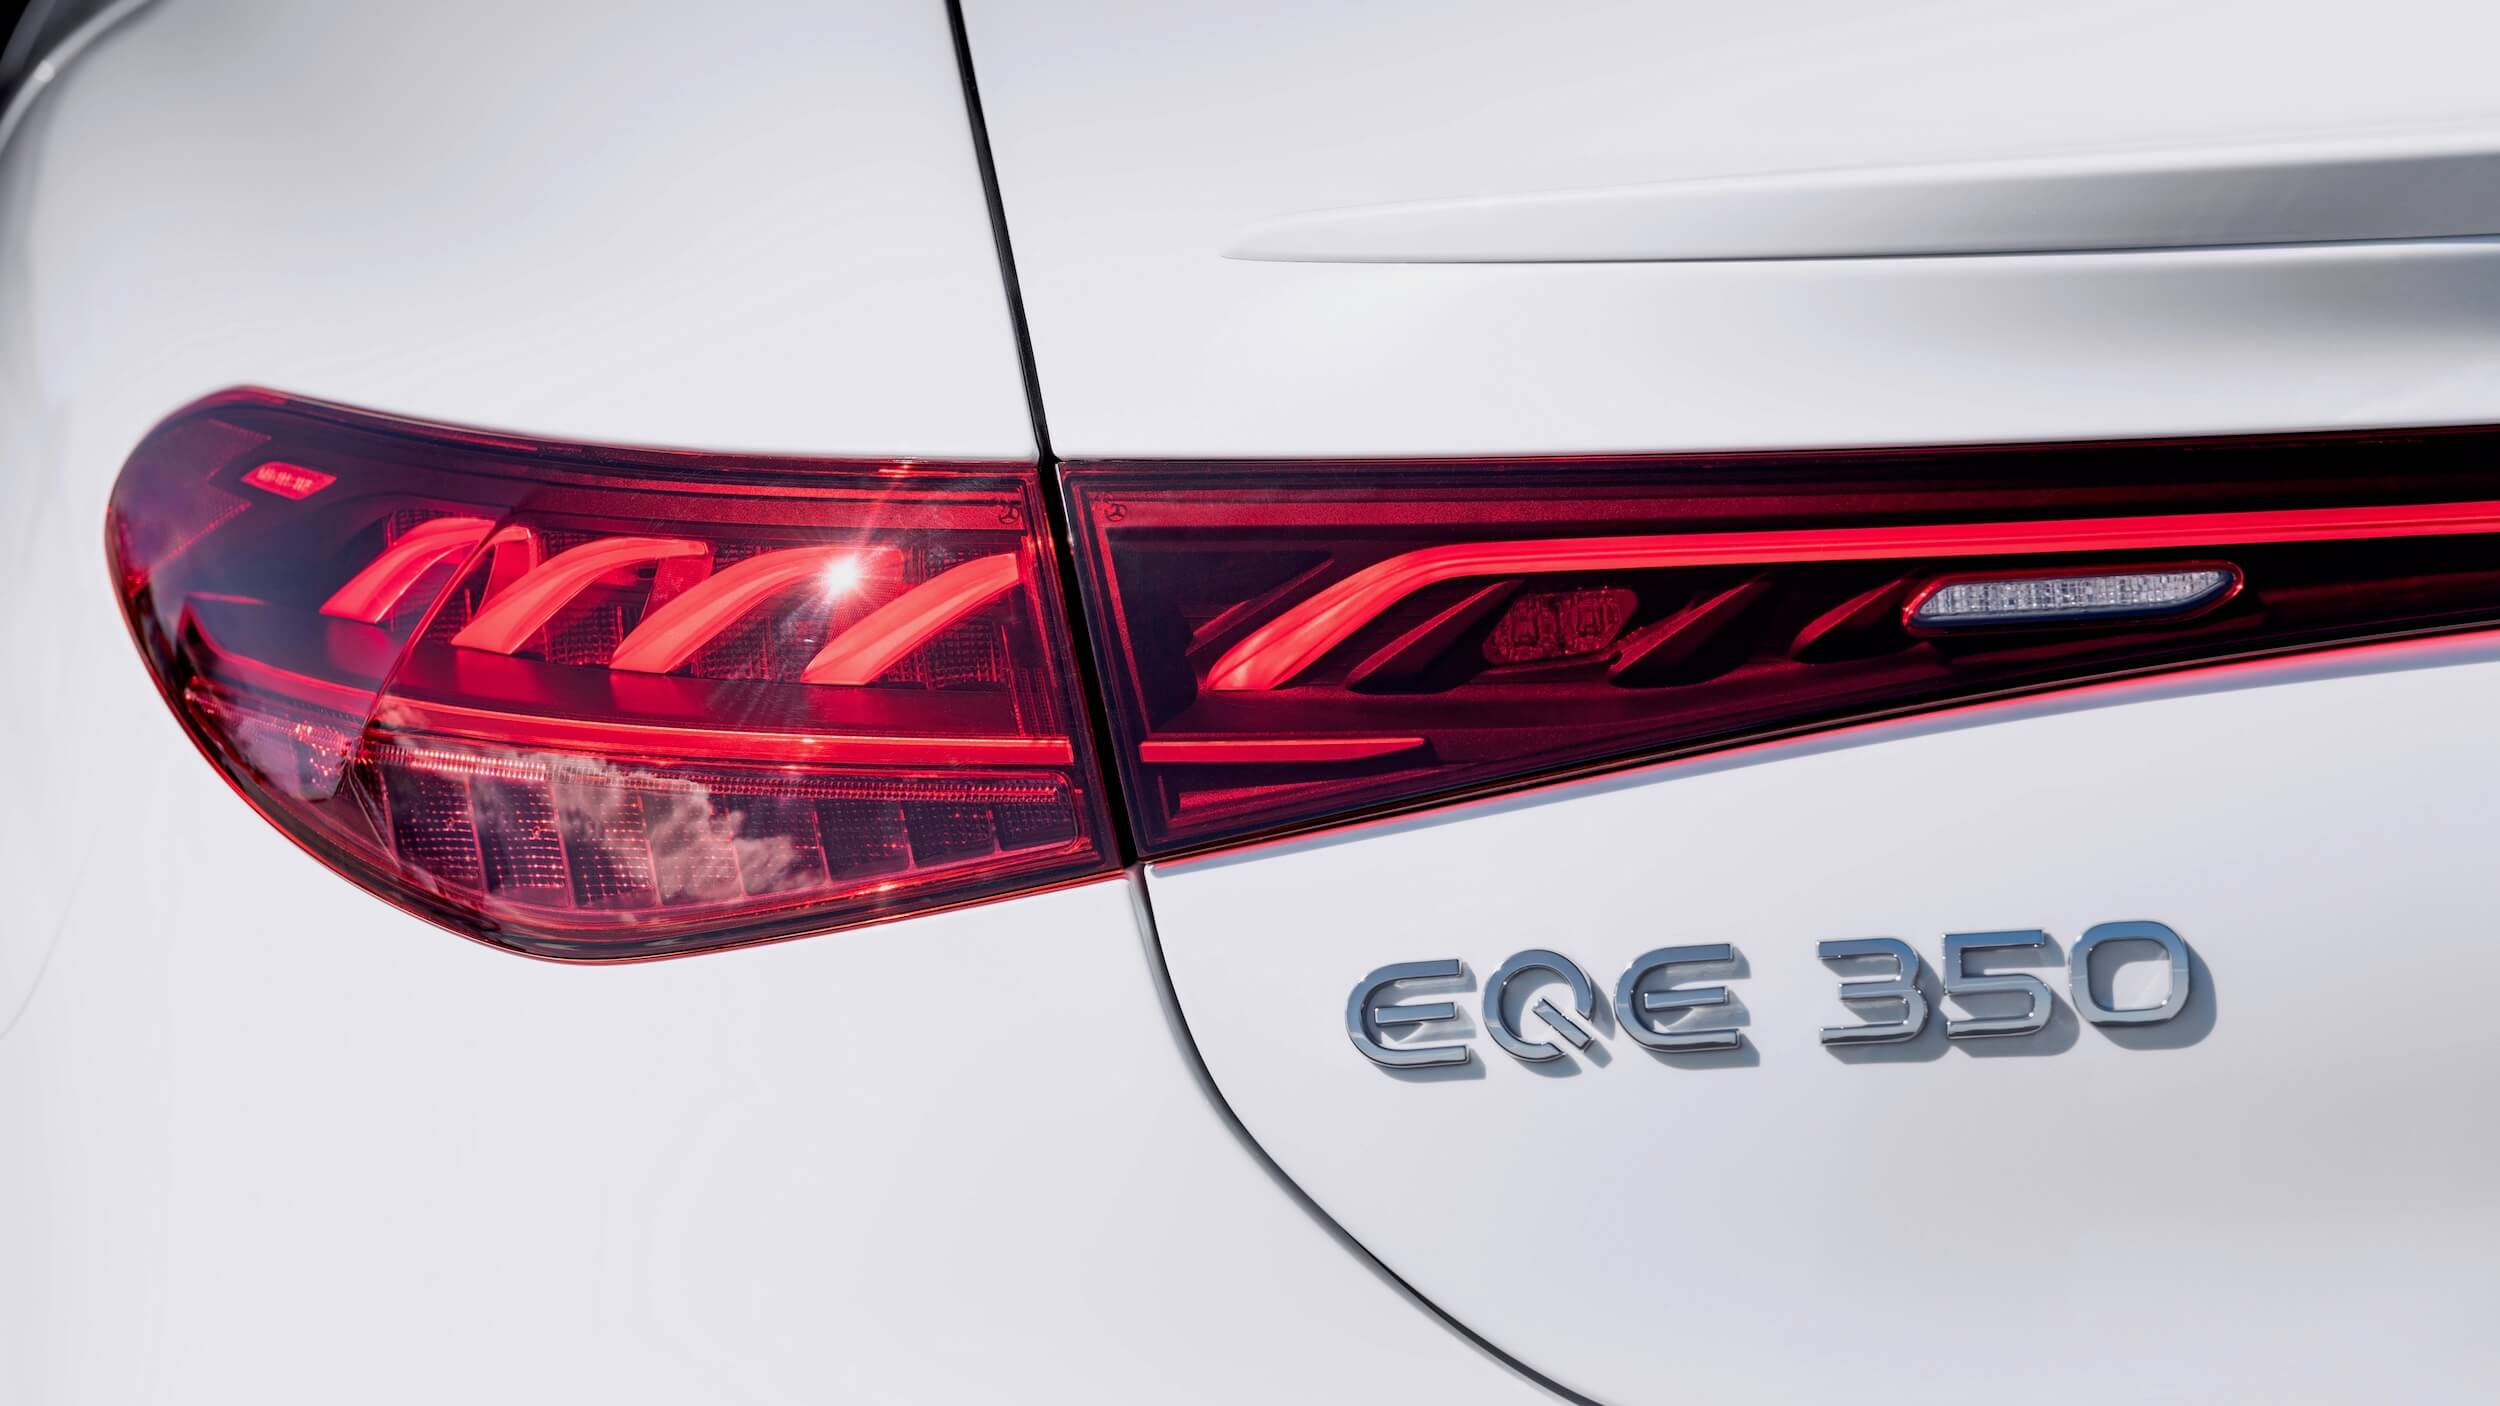 Mercedes EQE 350 8